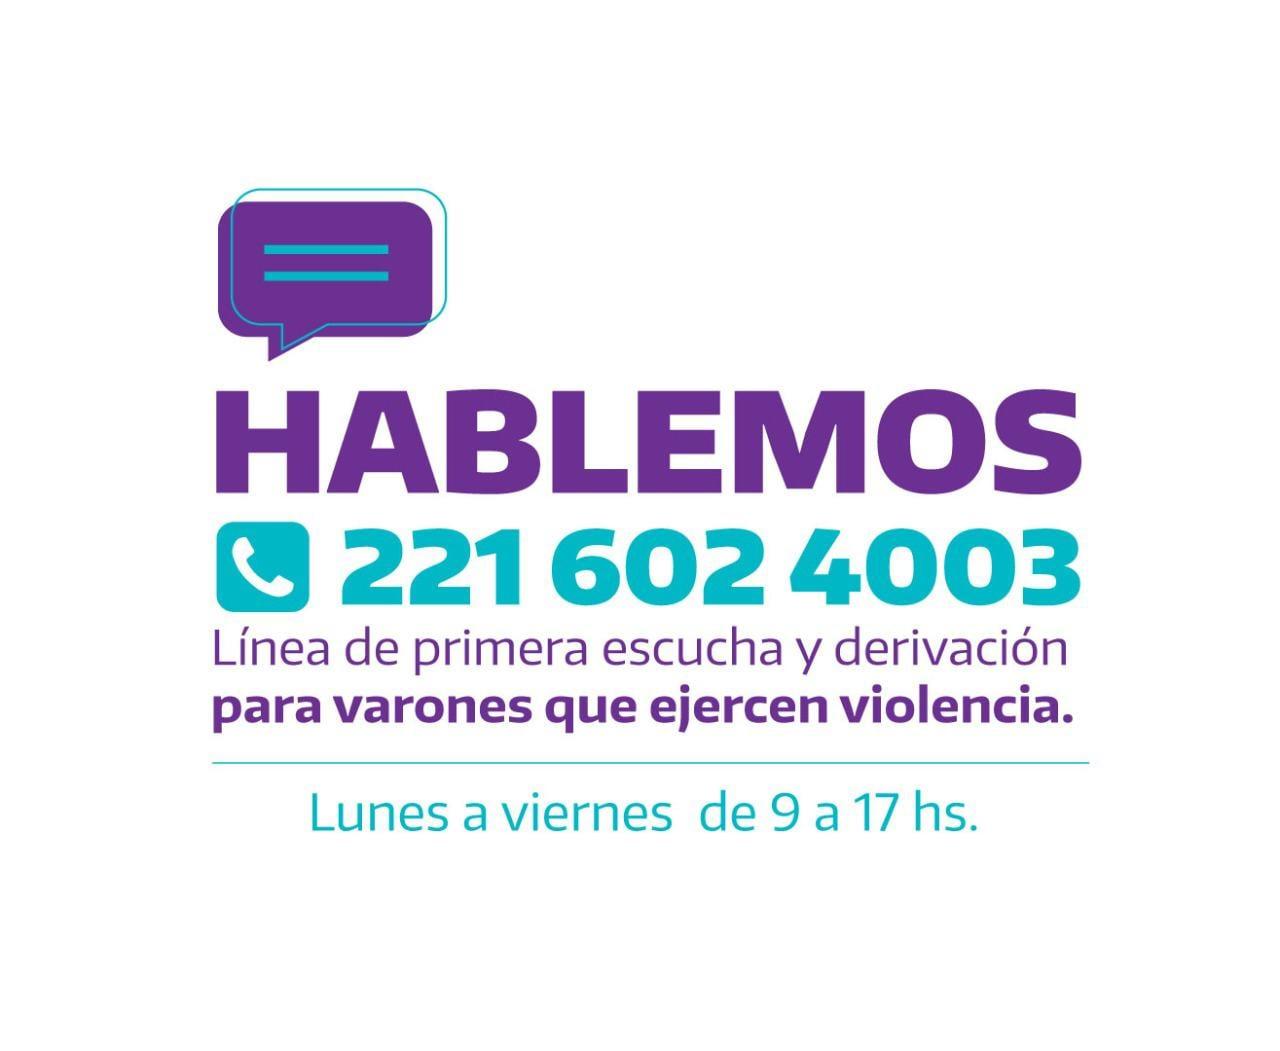 116382959_1702152426604265_8547704122914690191_o